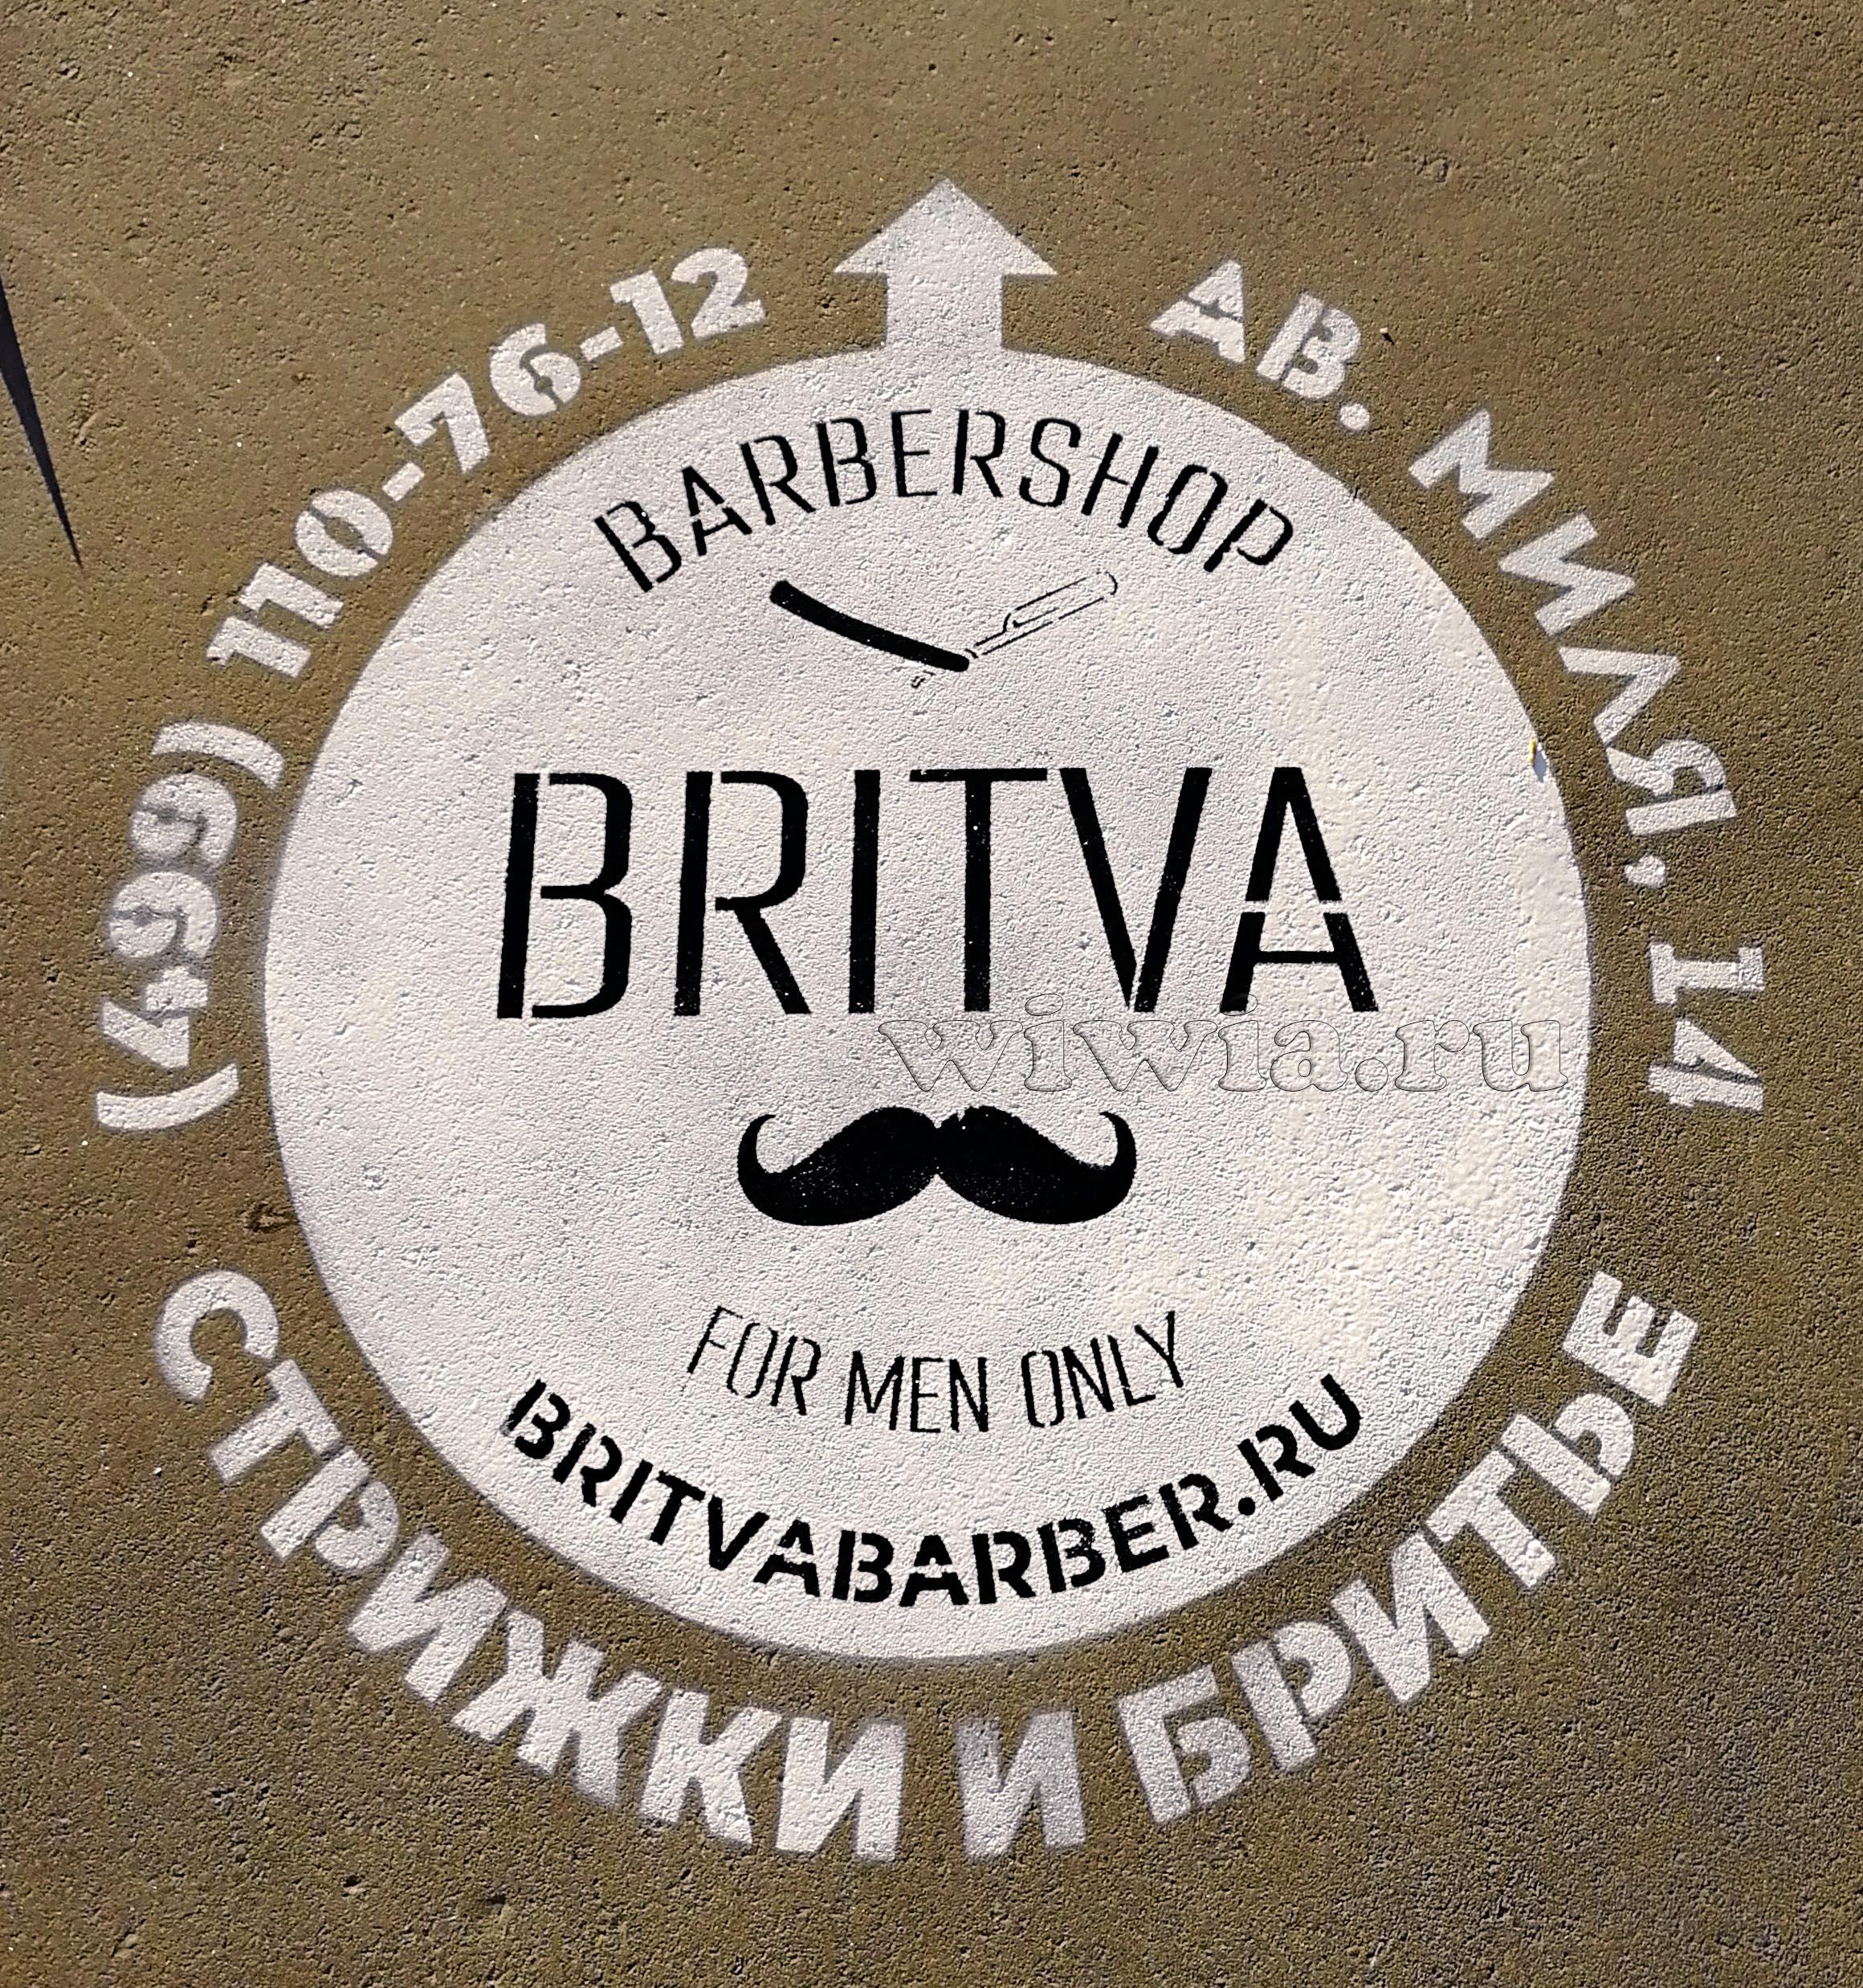 Указатели на тротуаре для сети барбершопов Бритва.